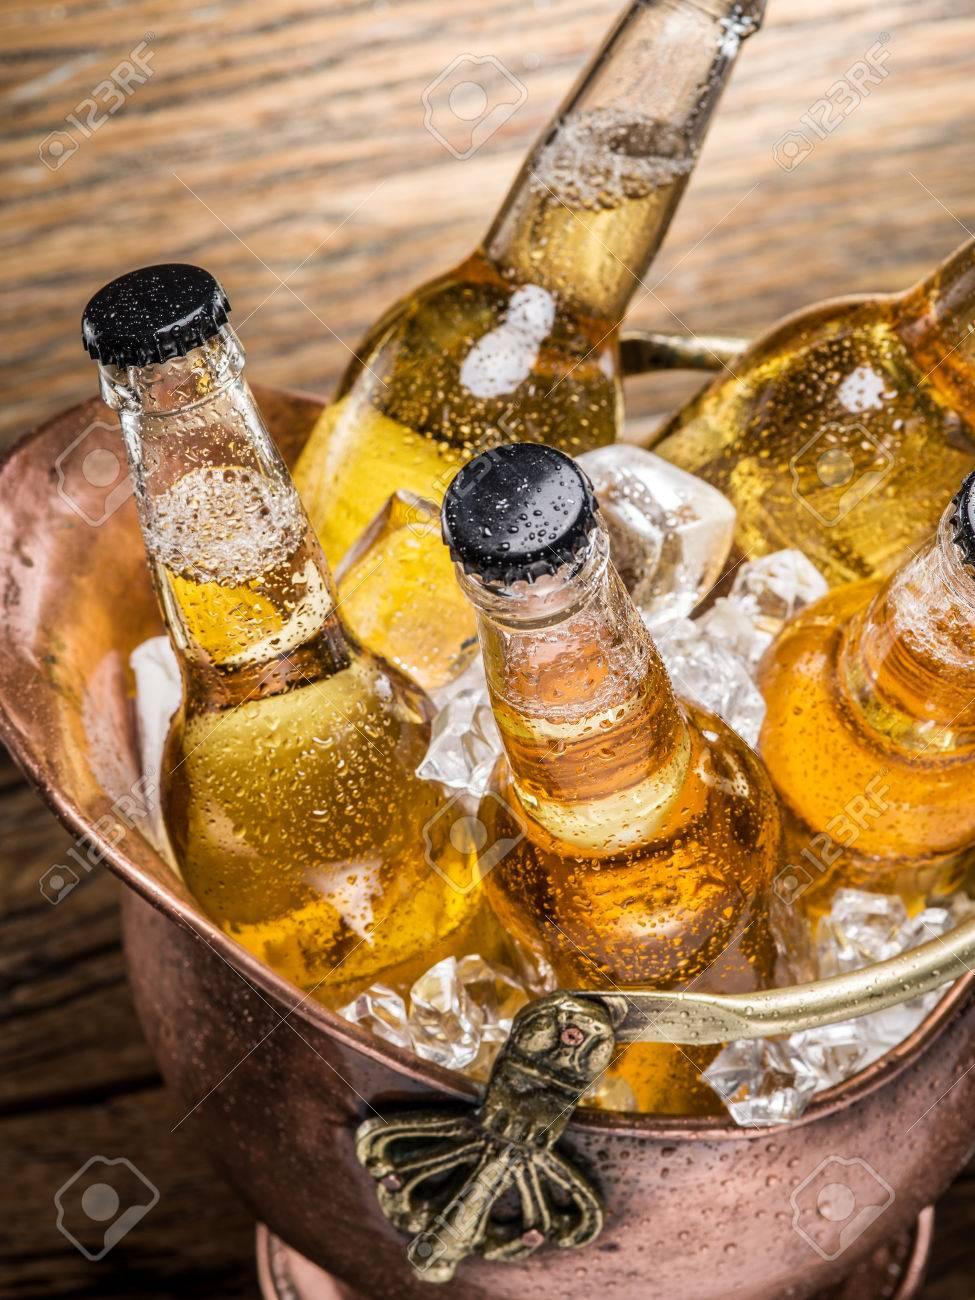 Cold bottles of beer in the brazen bucket on the wooden table. Standard-Bild - 55721153